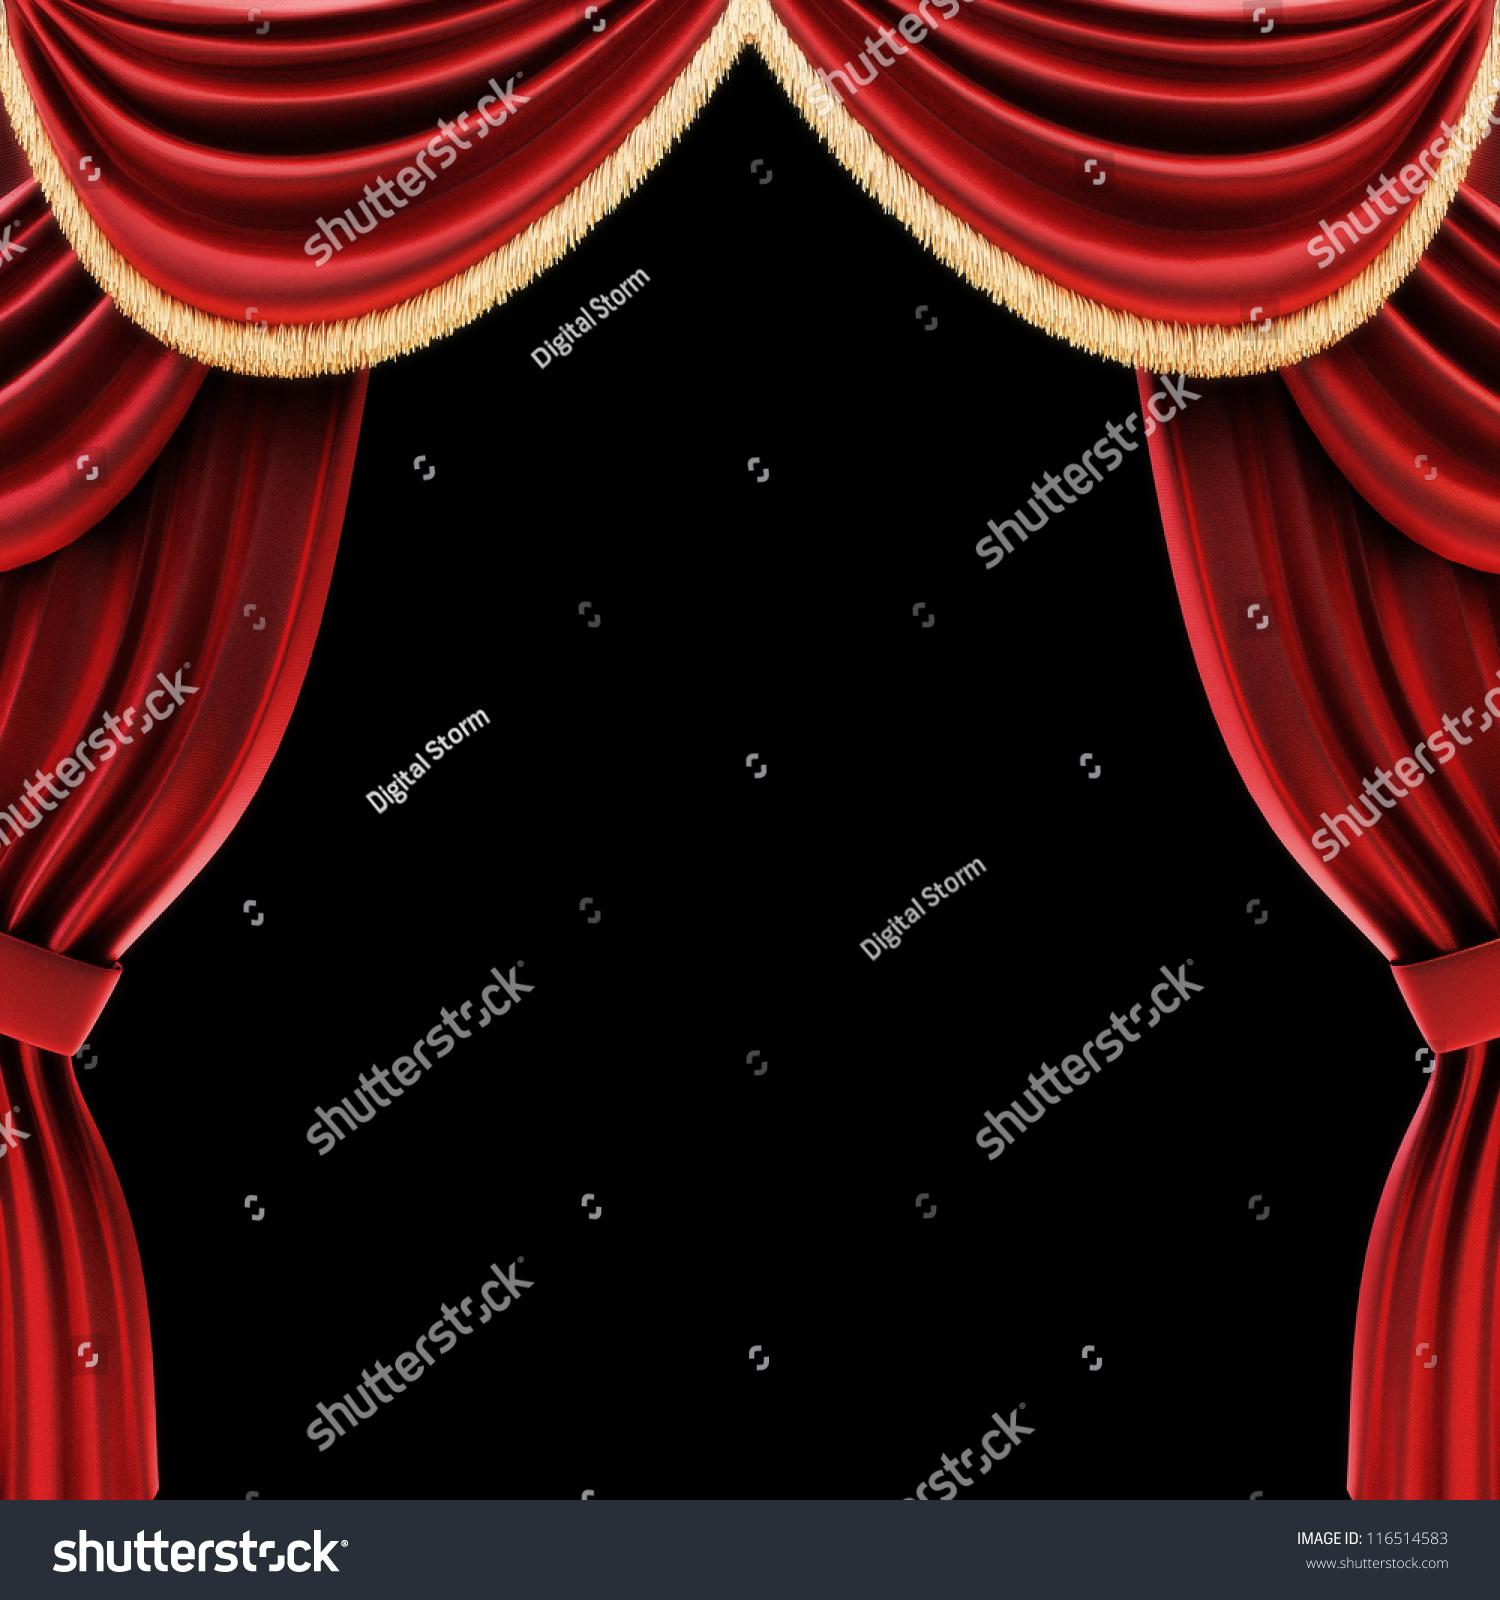 Real open stage curtains - Real Open Stage Curtains Open Theater Drapes Or Stage Curtains With A Black Background